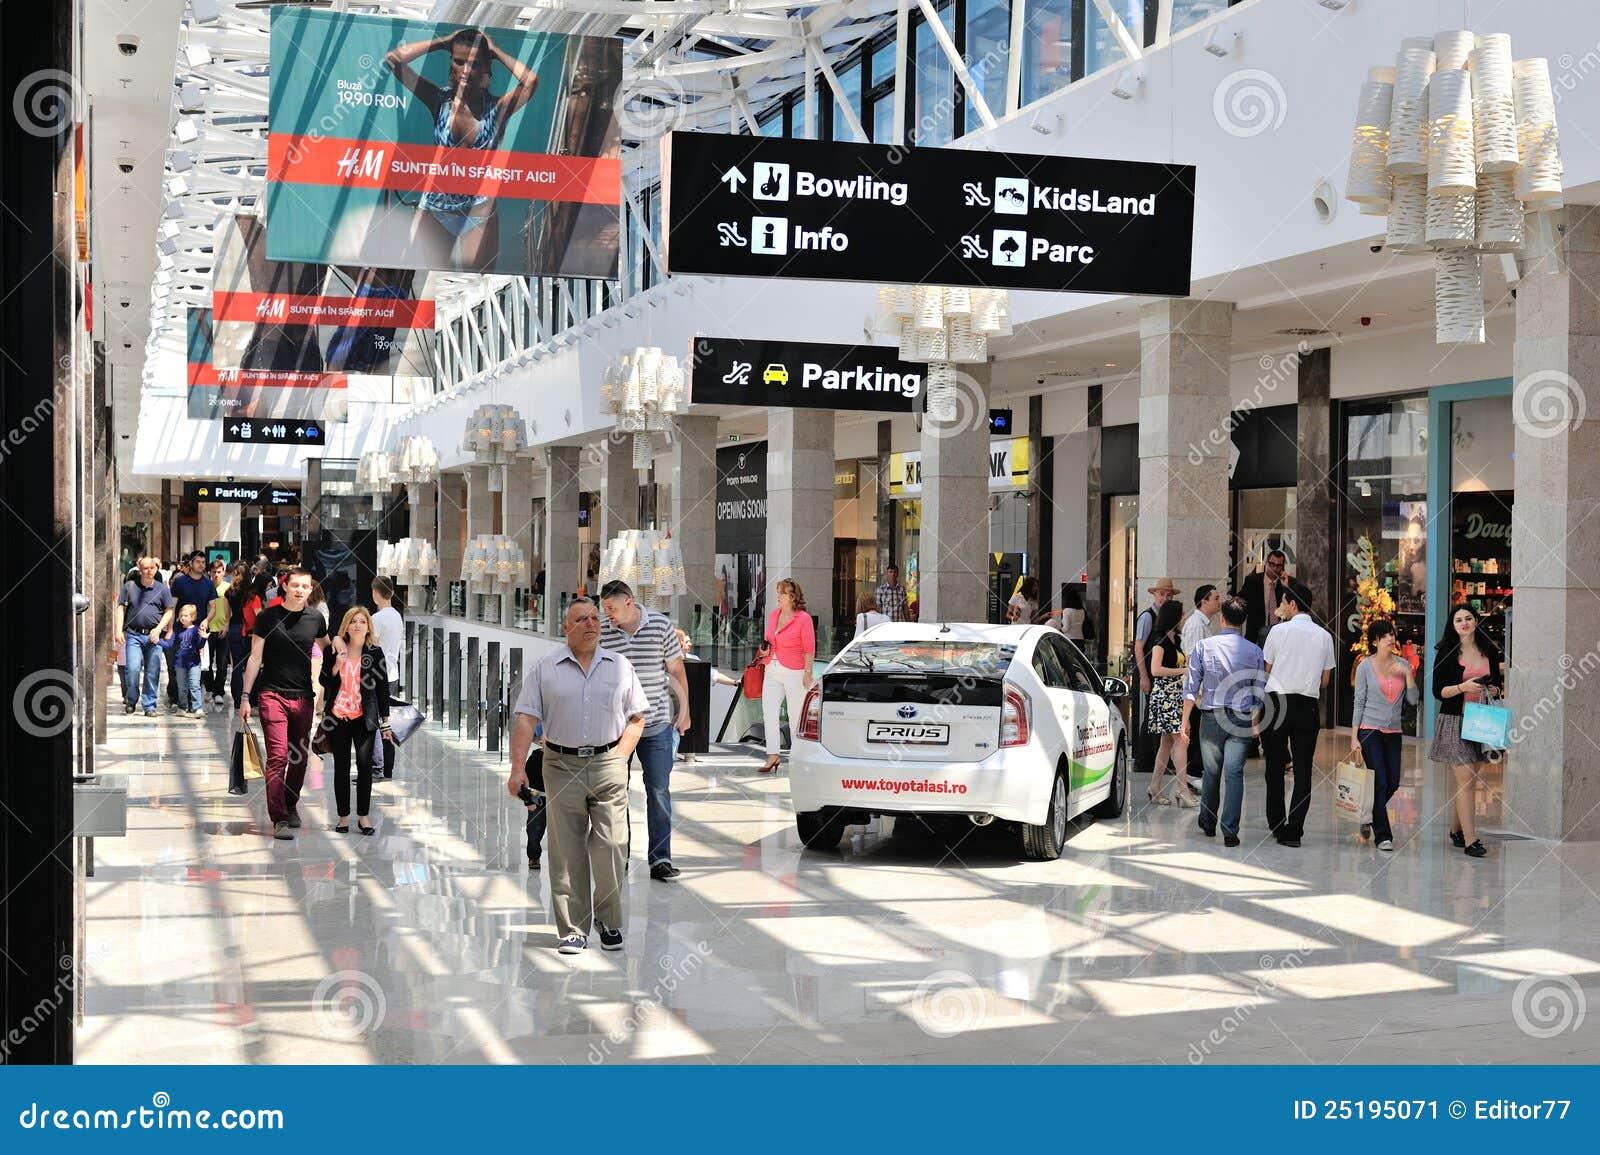 escalator with people clip art